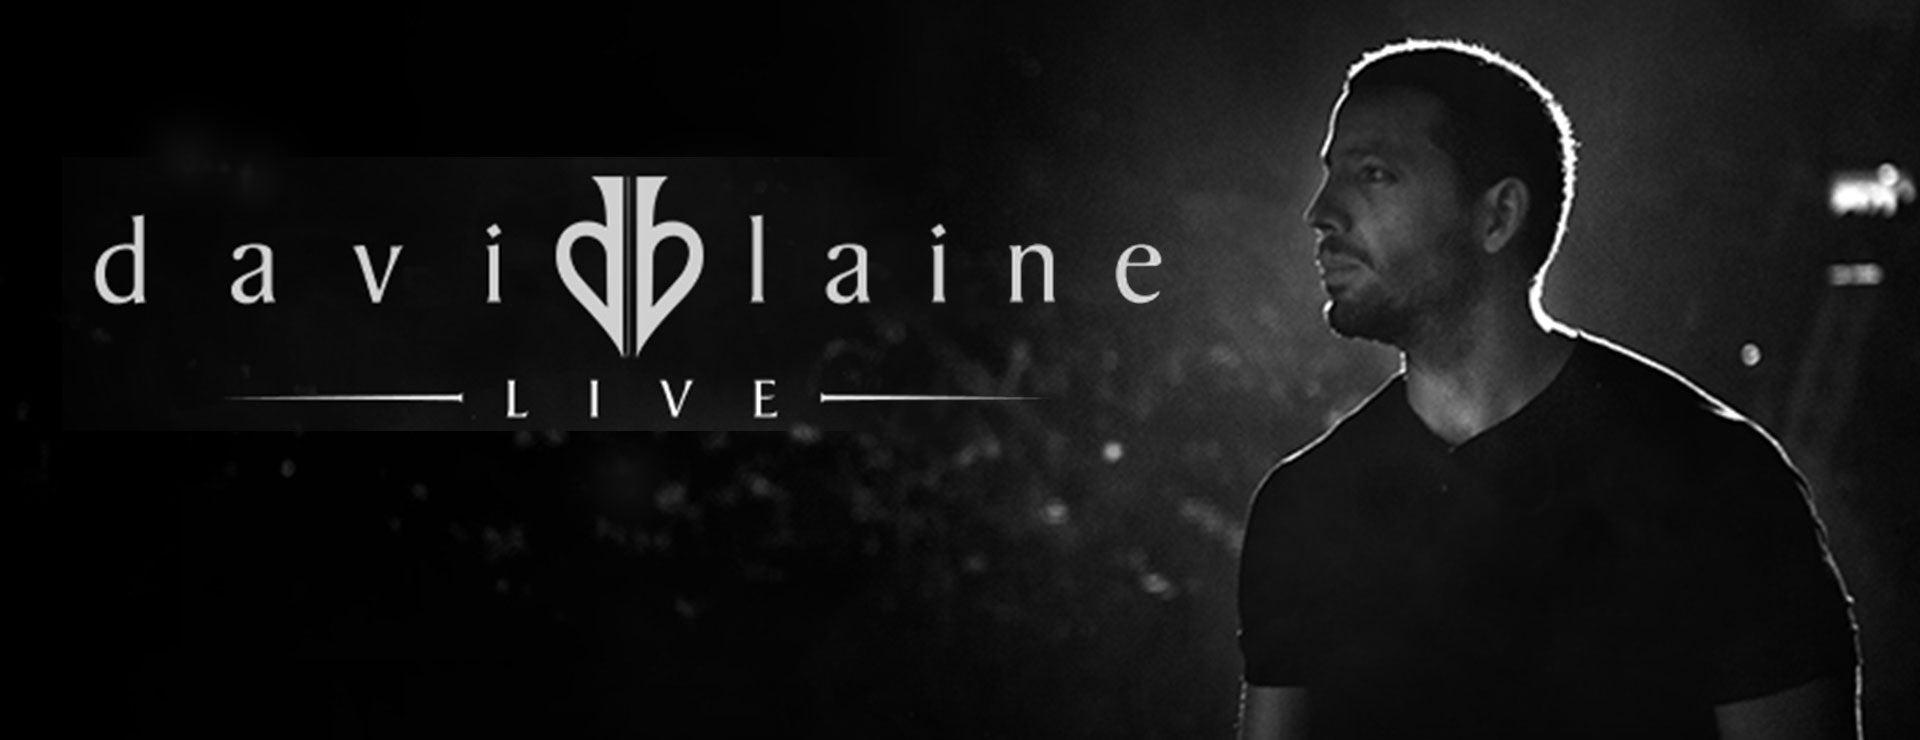 david-blaine-feature.jpg